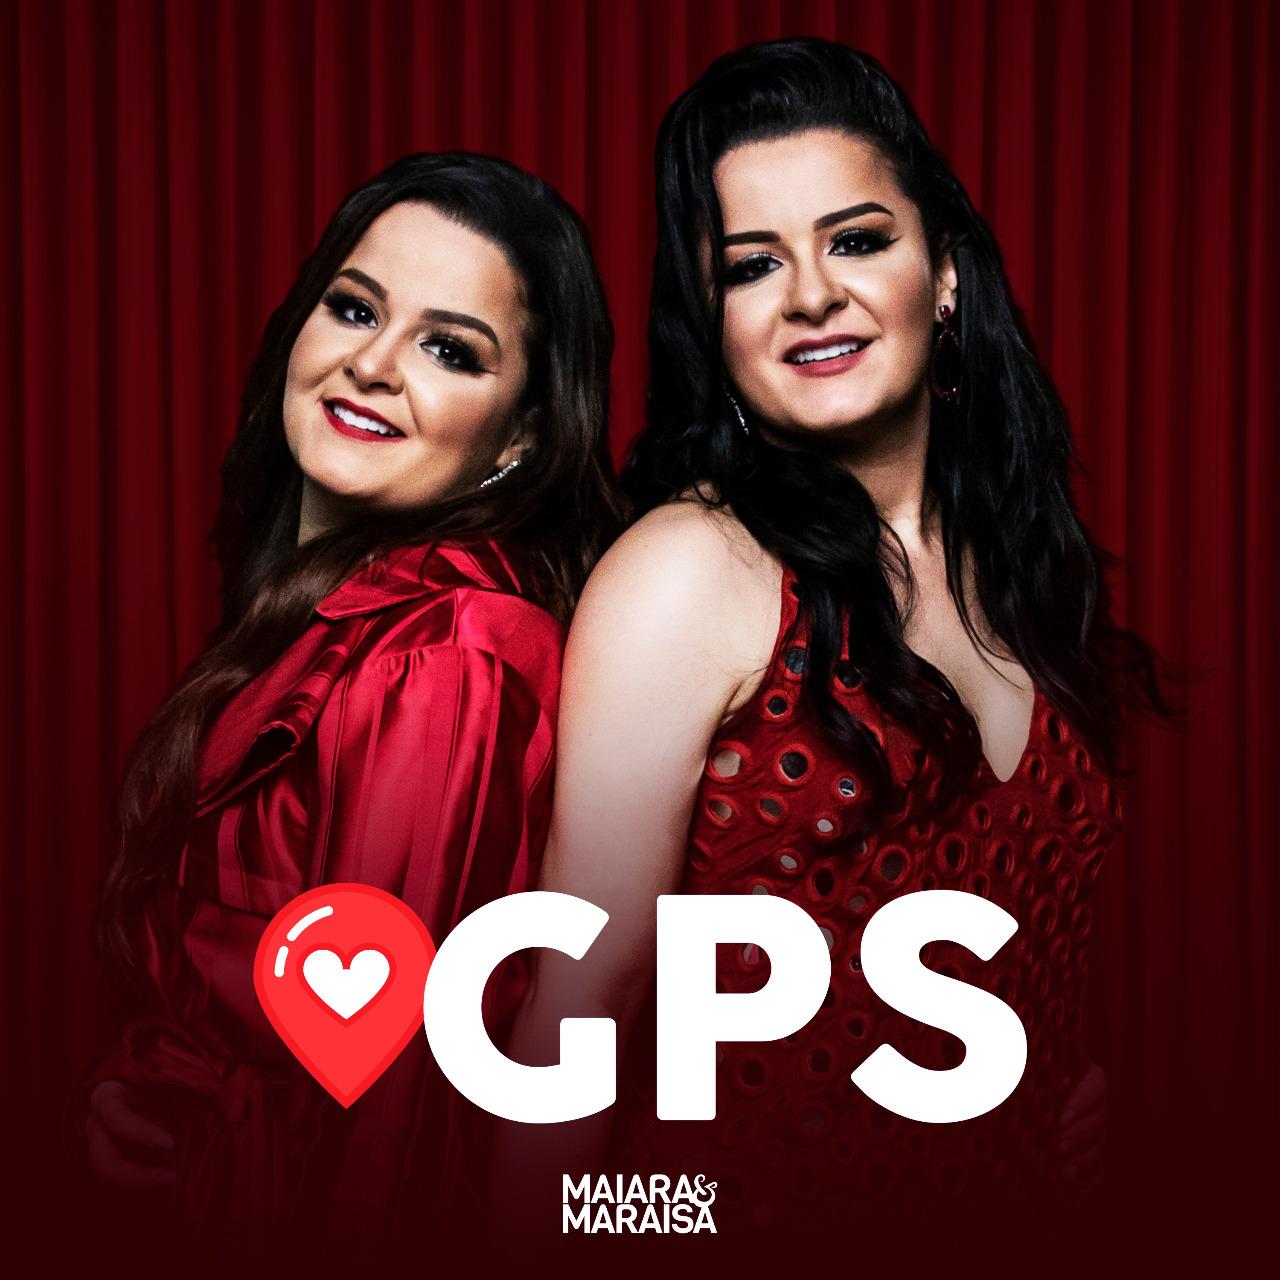 'GPS' é a nova música de Maiara & Maraísa 41